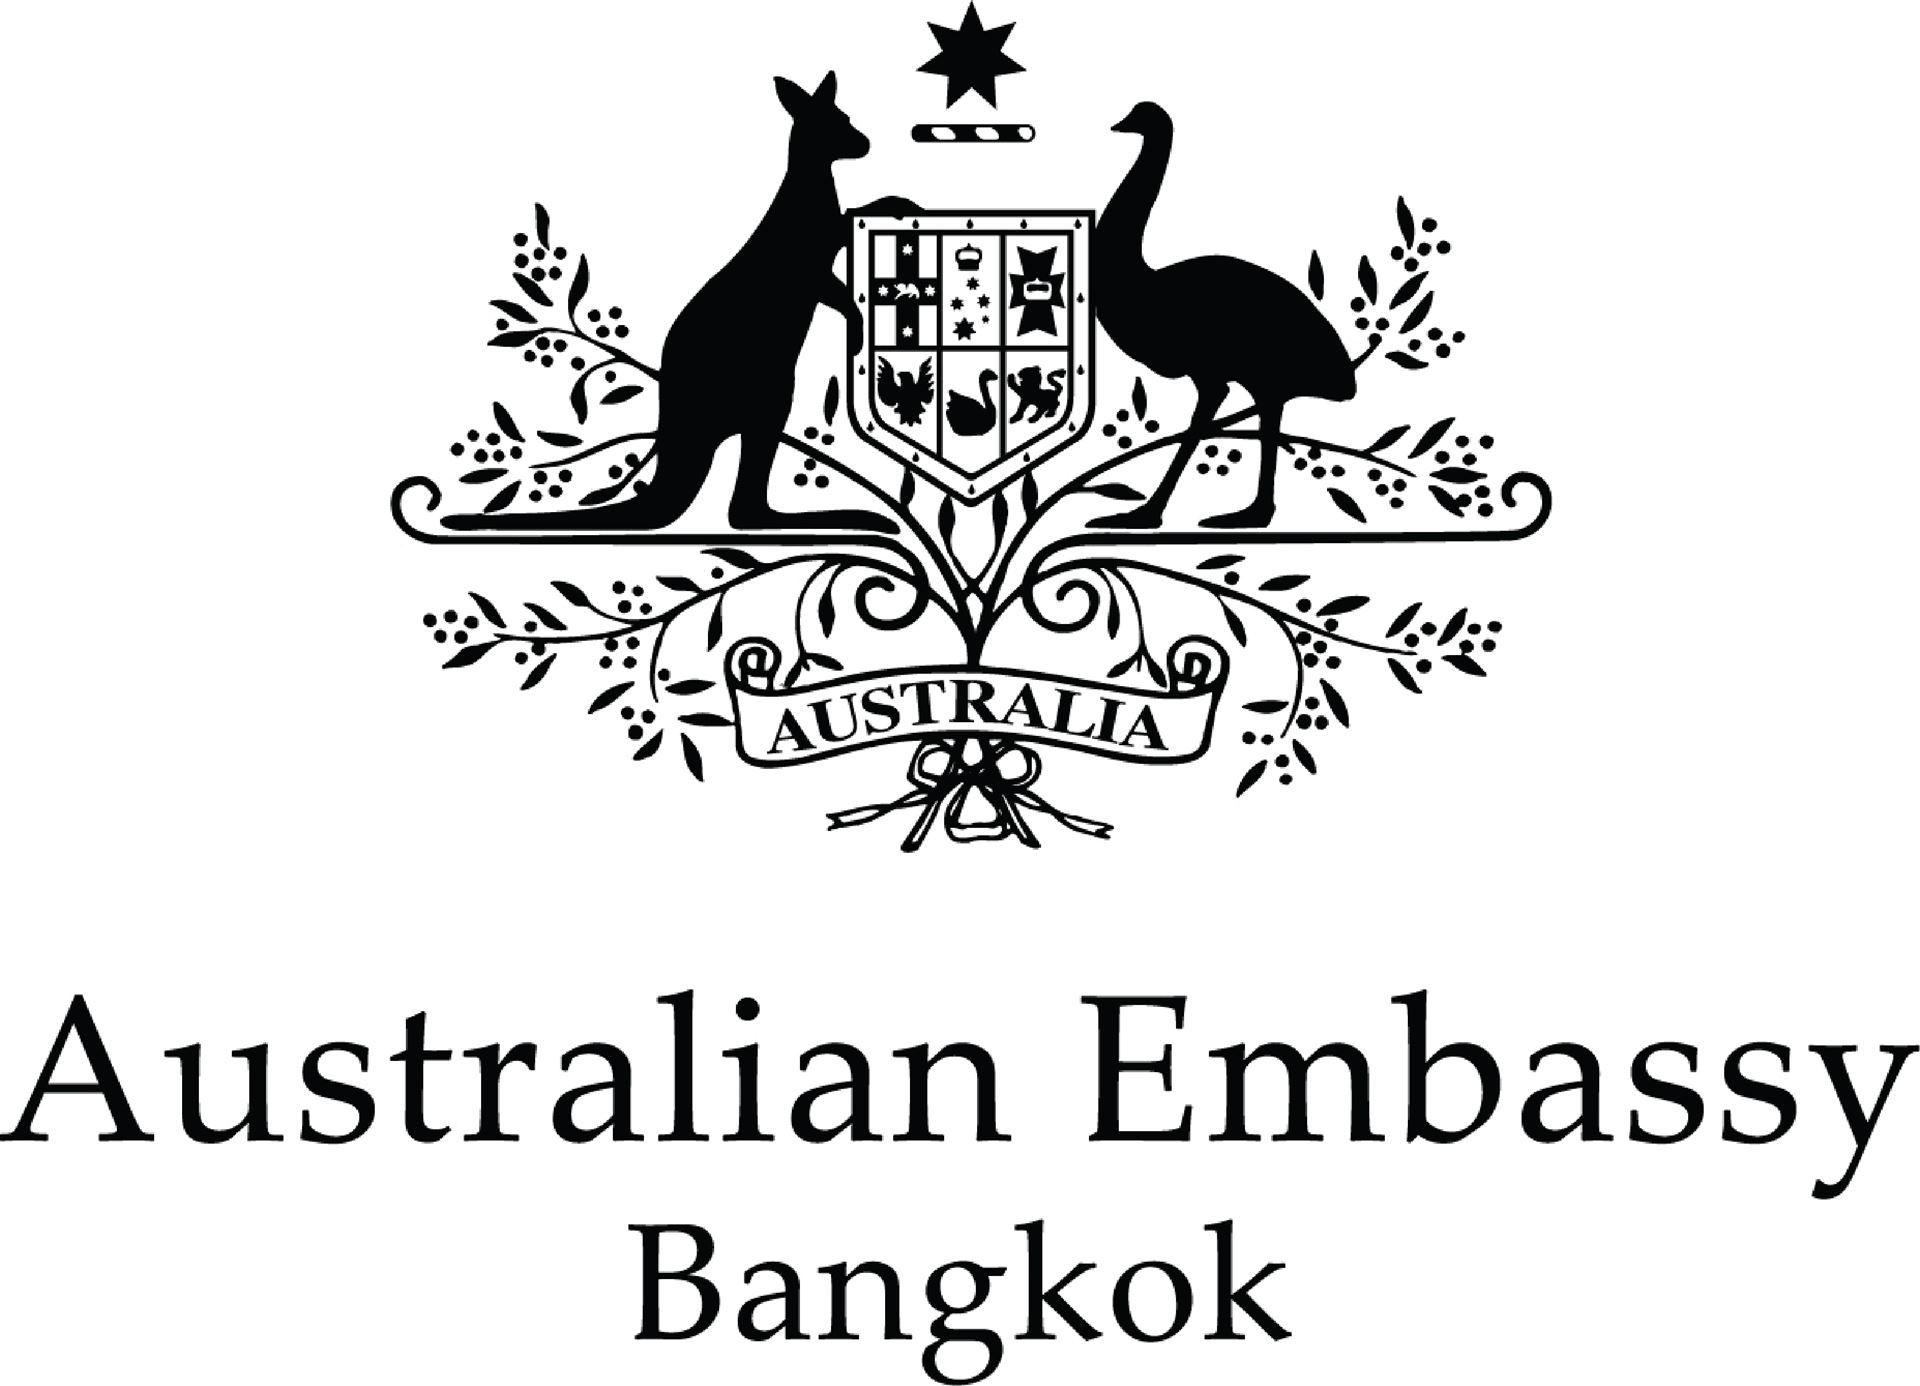 Australian Embassy Bangkok Visa Application Form